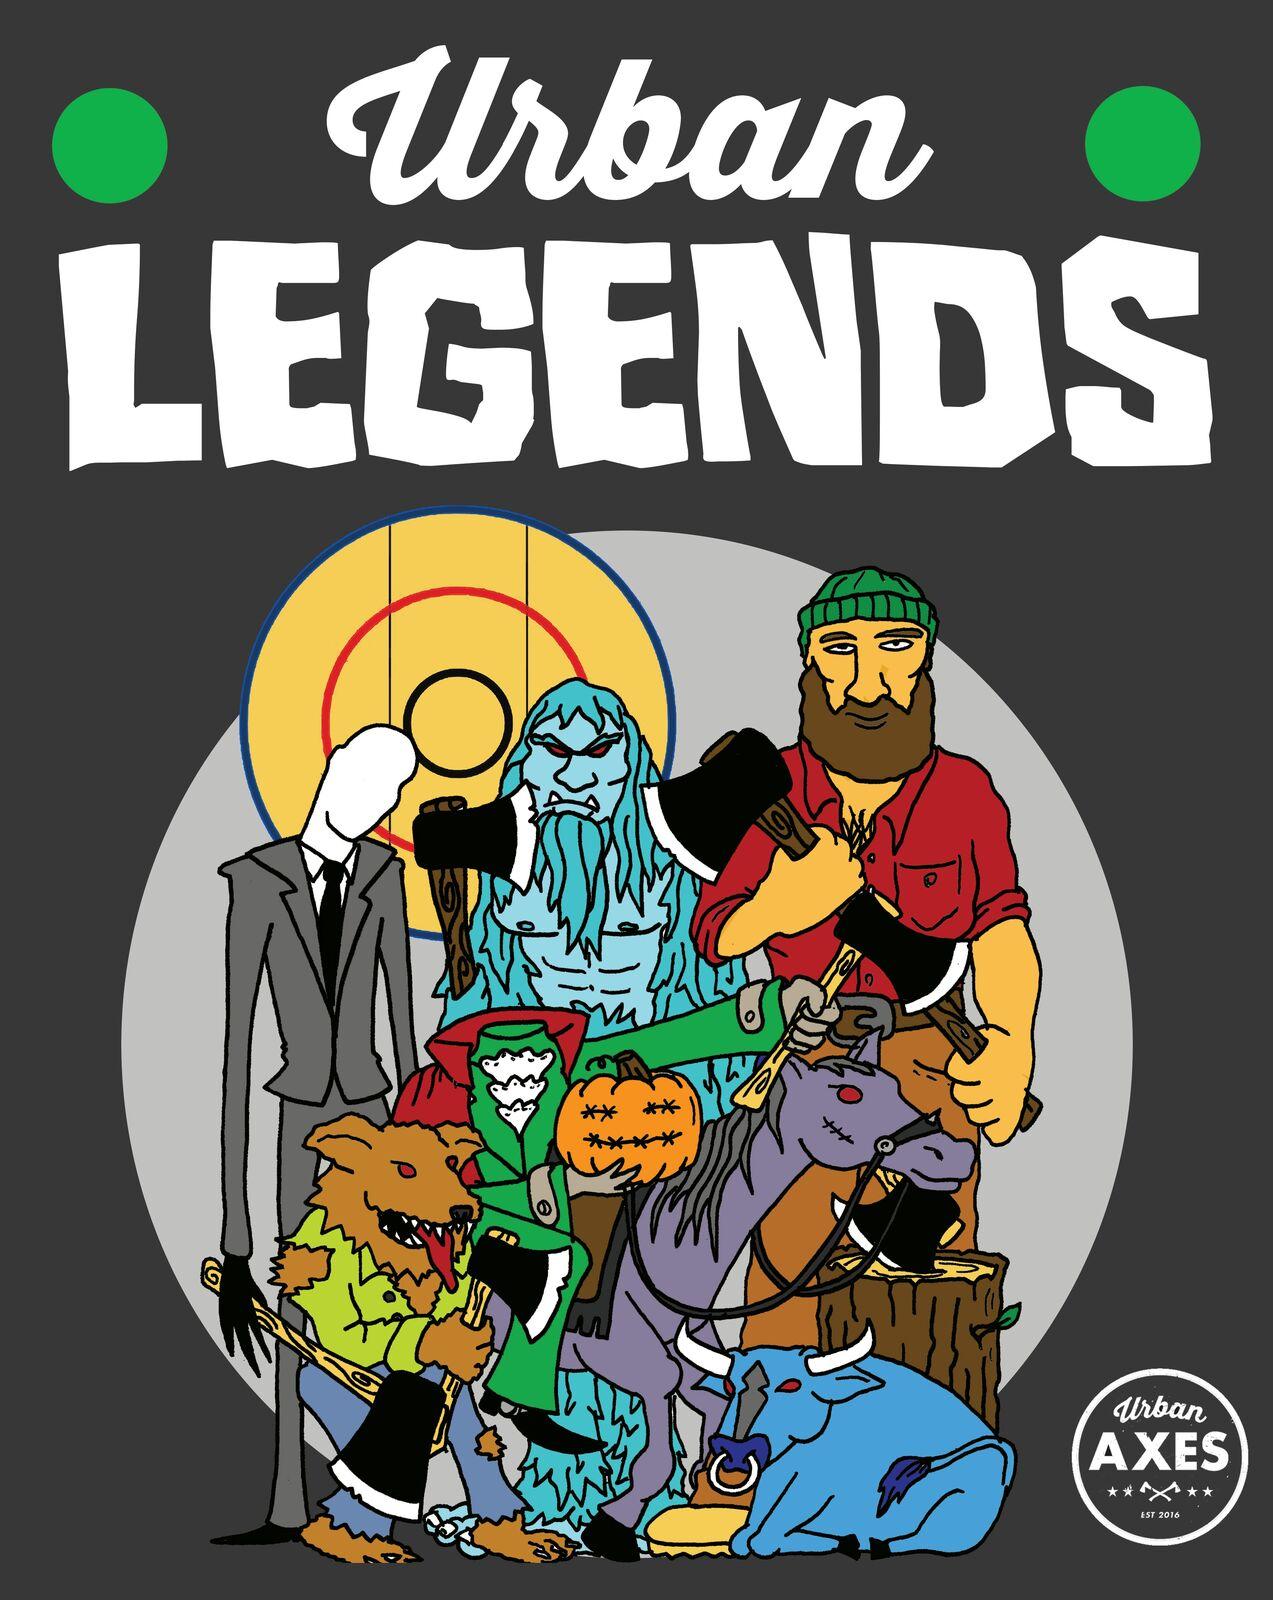 Urban Legends Poster